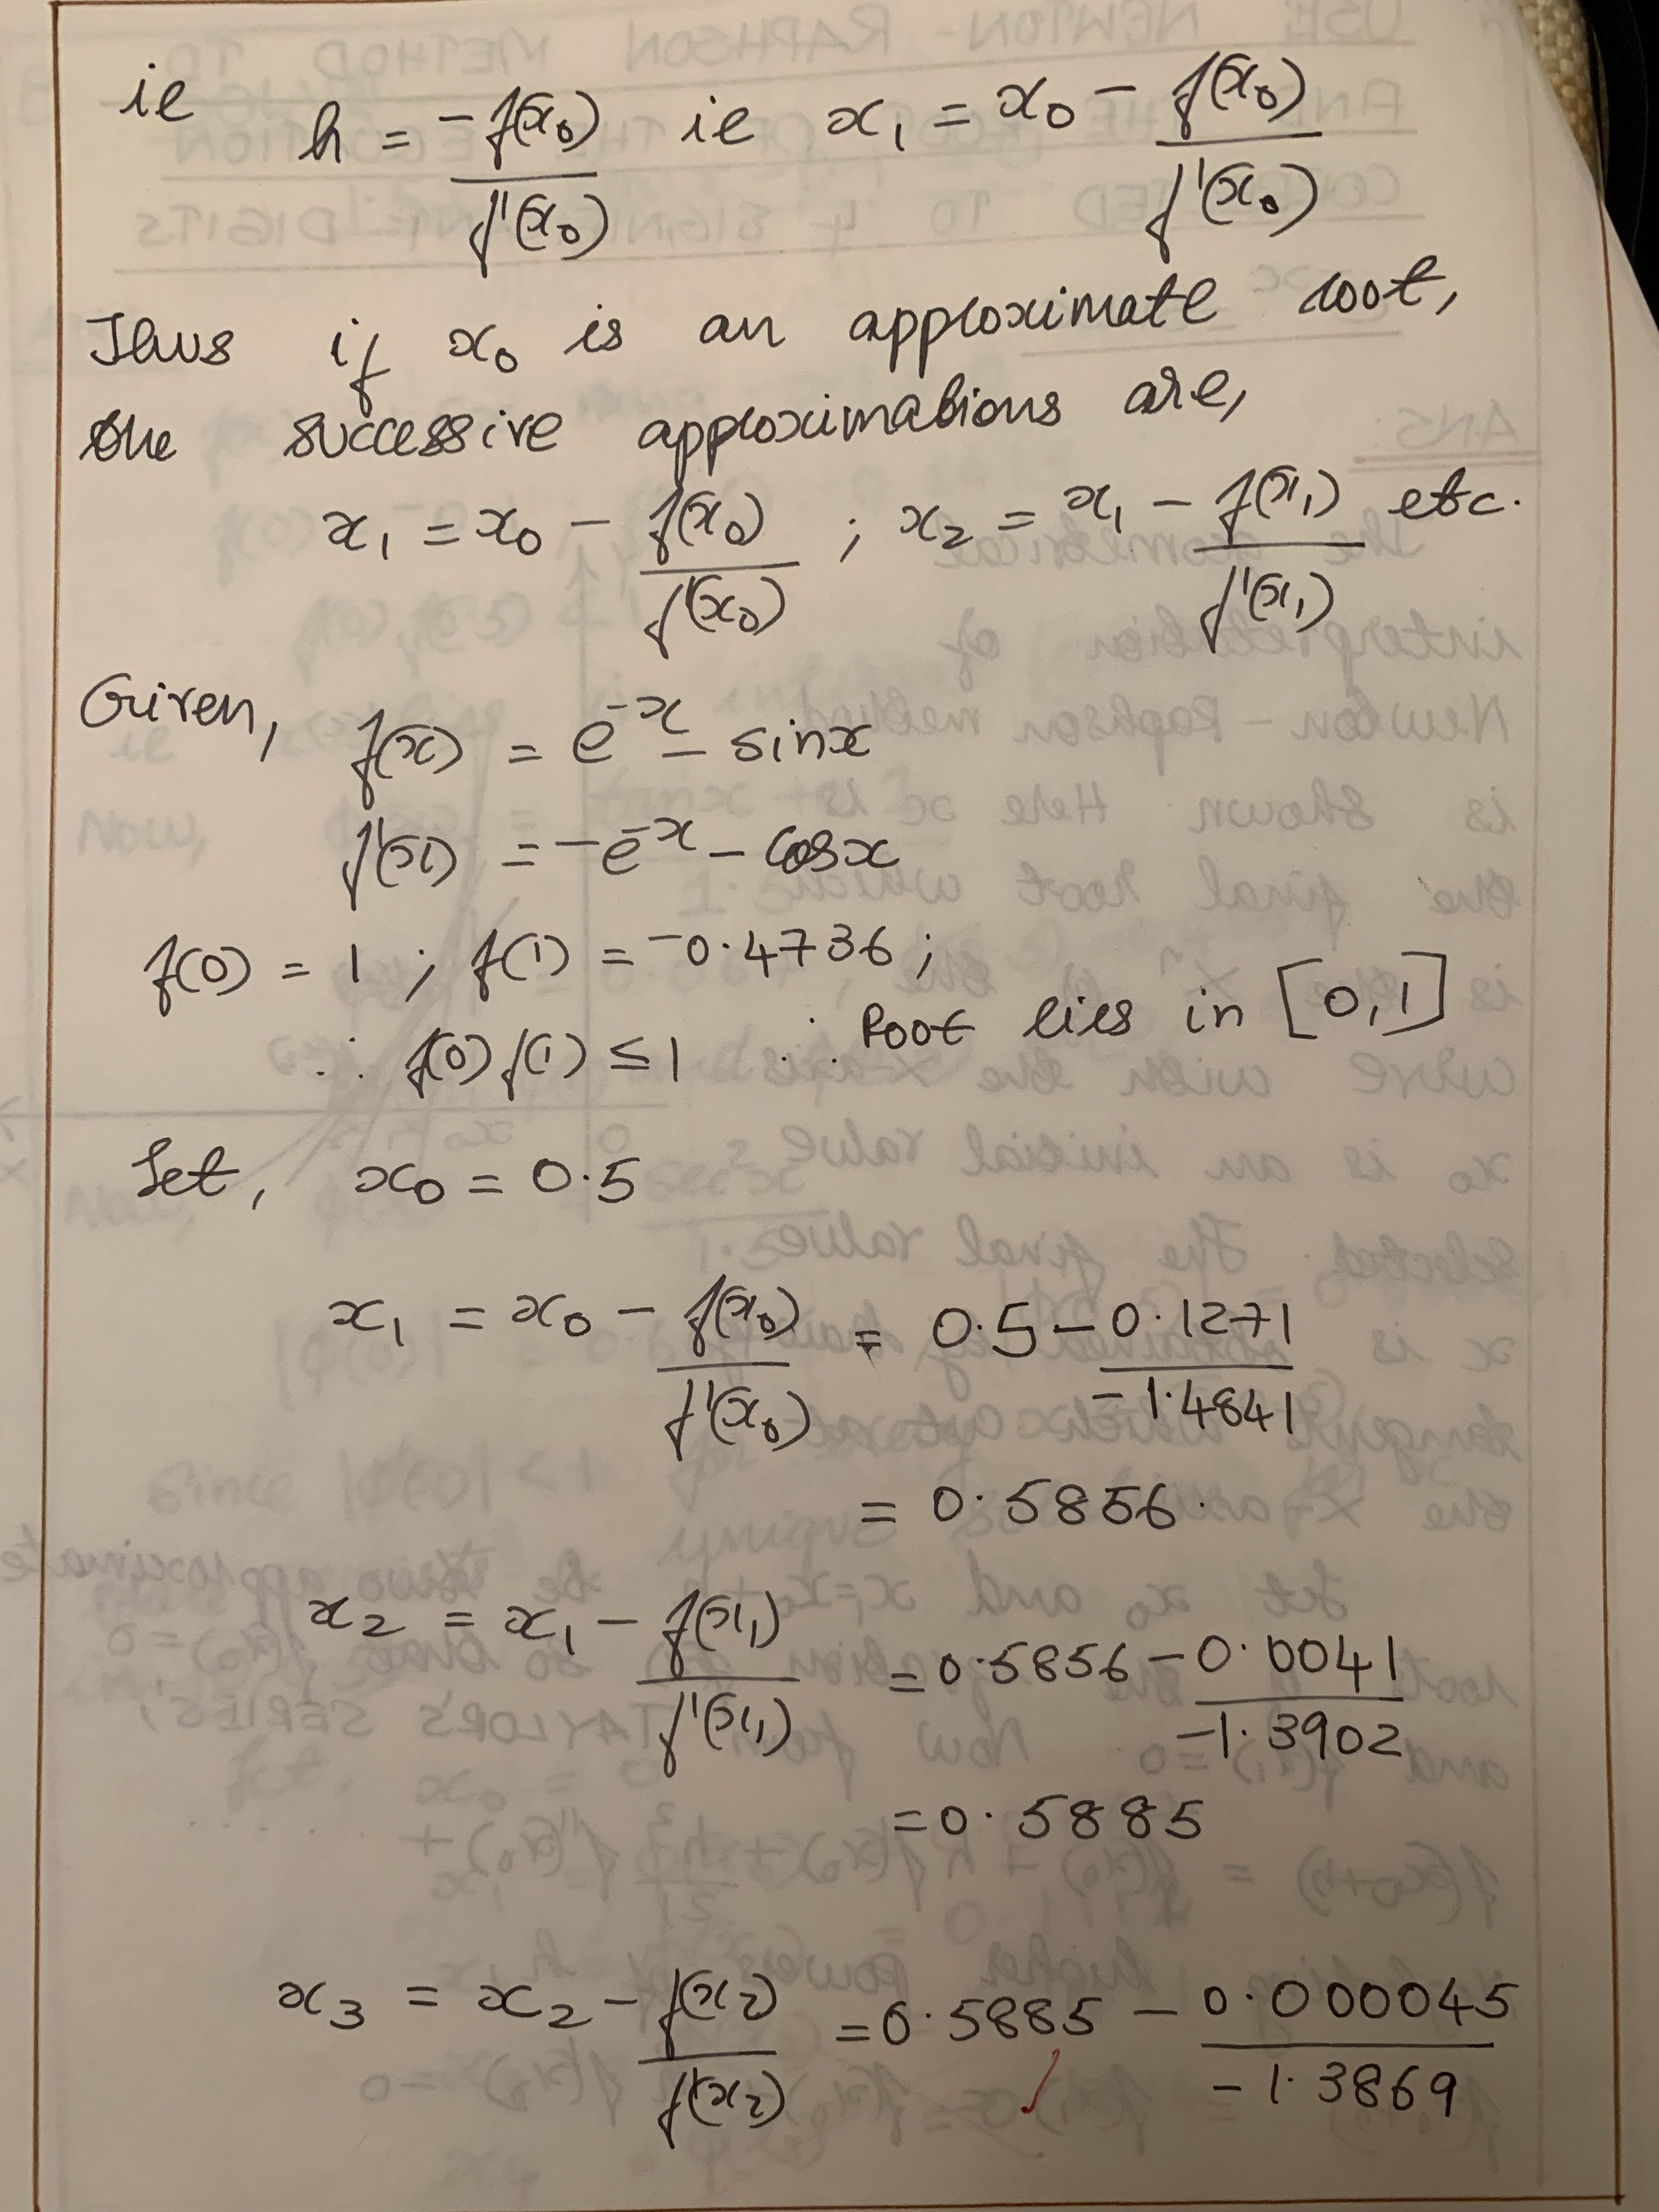 newton-raphson-methods-2